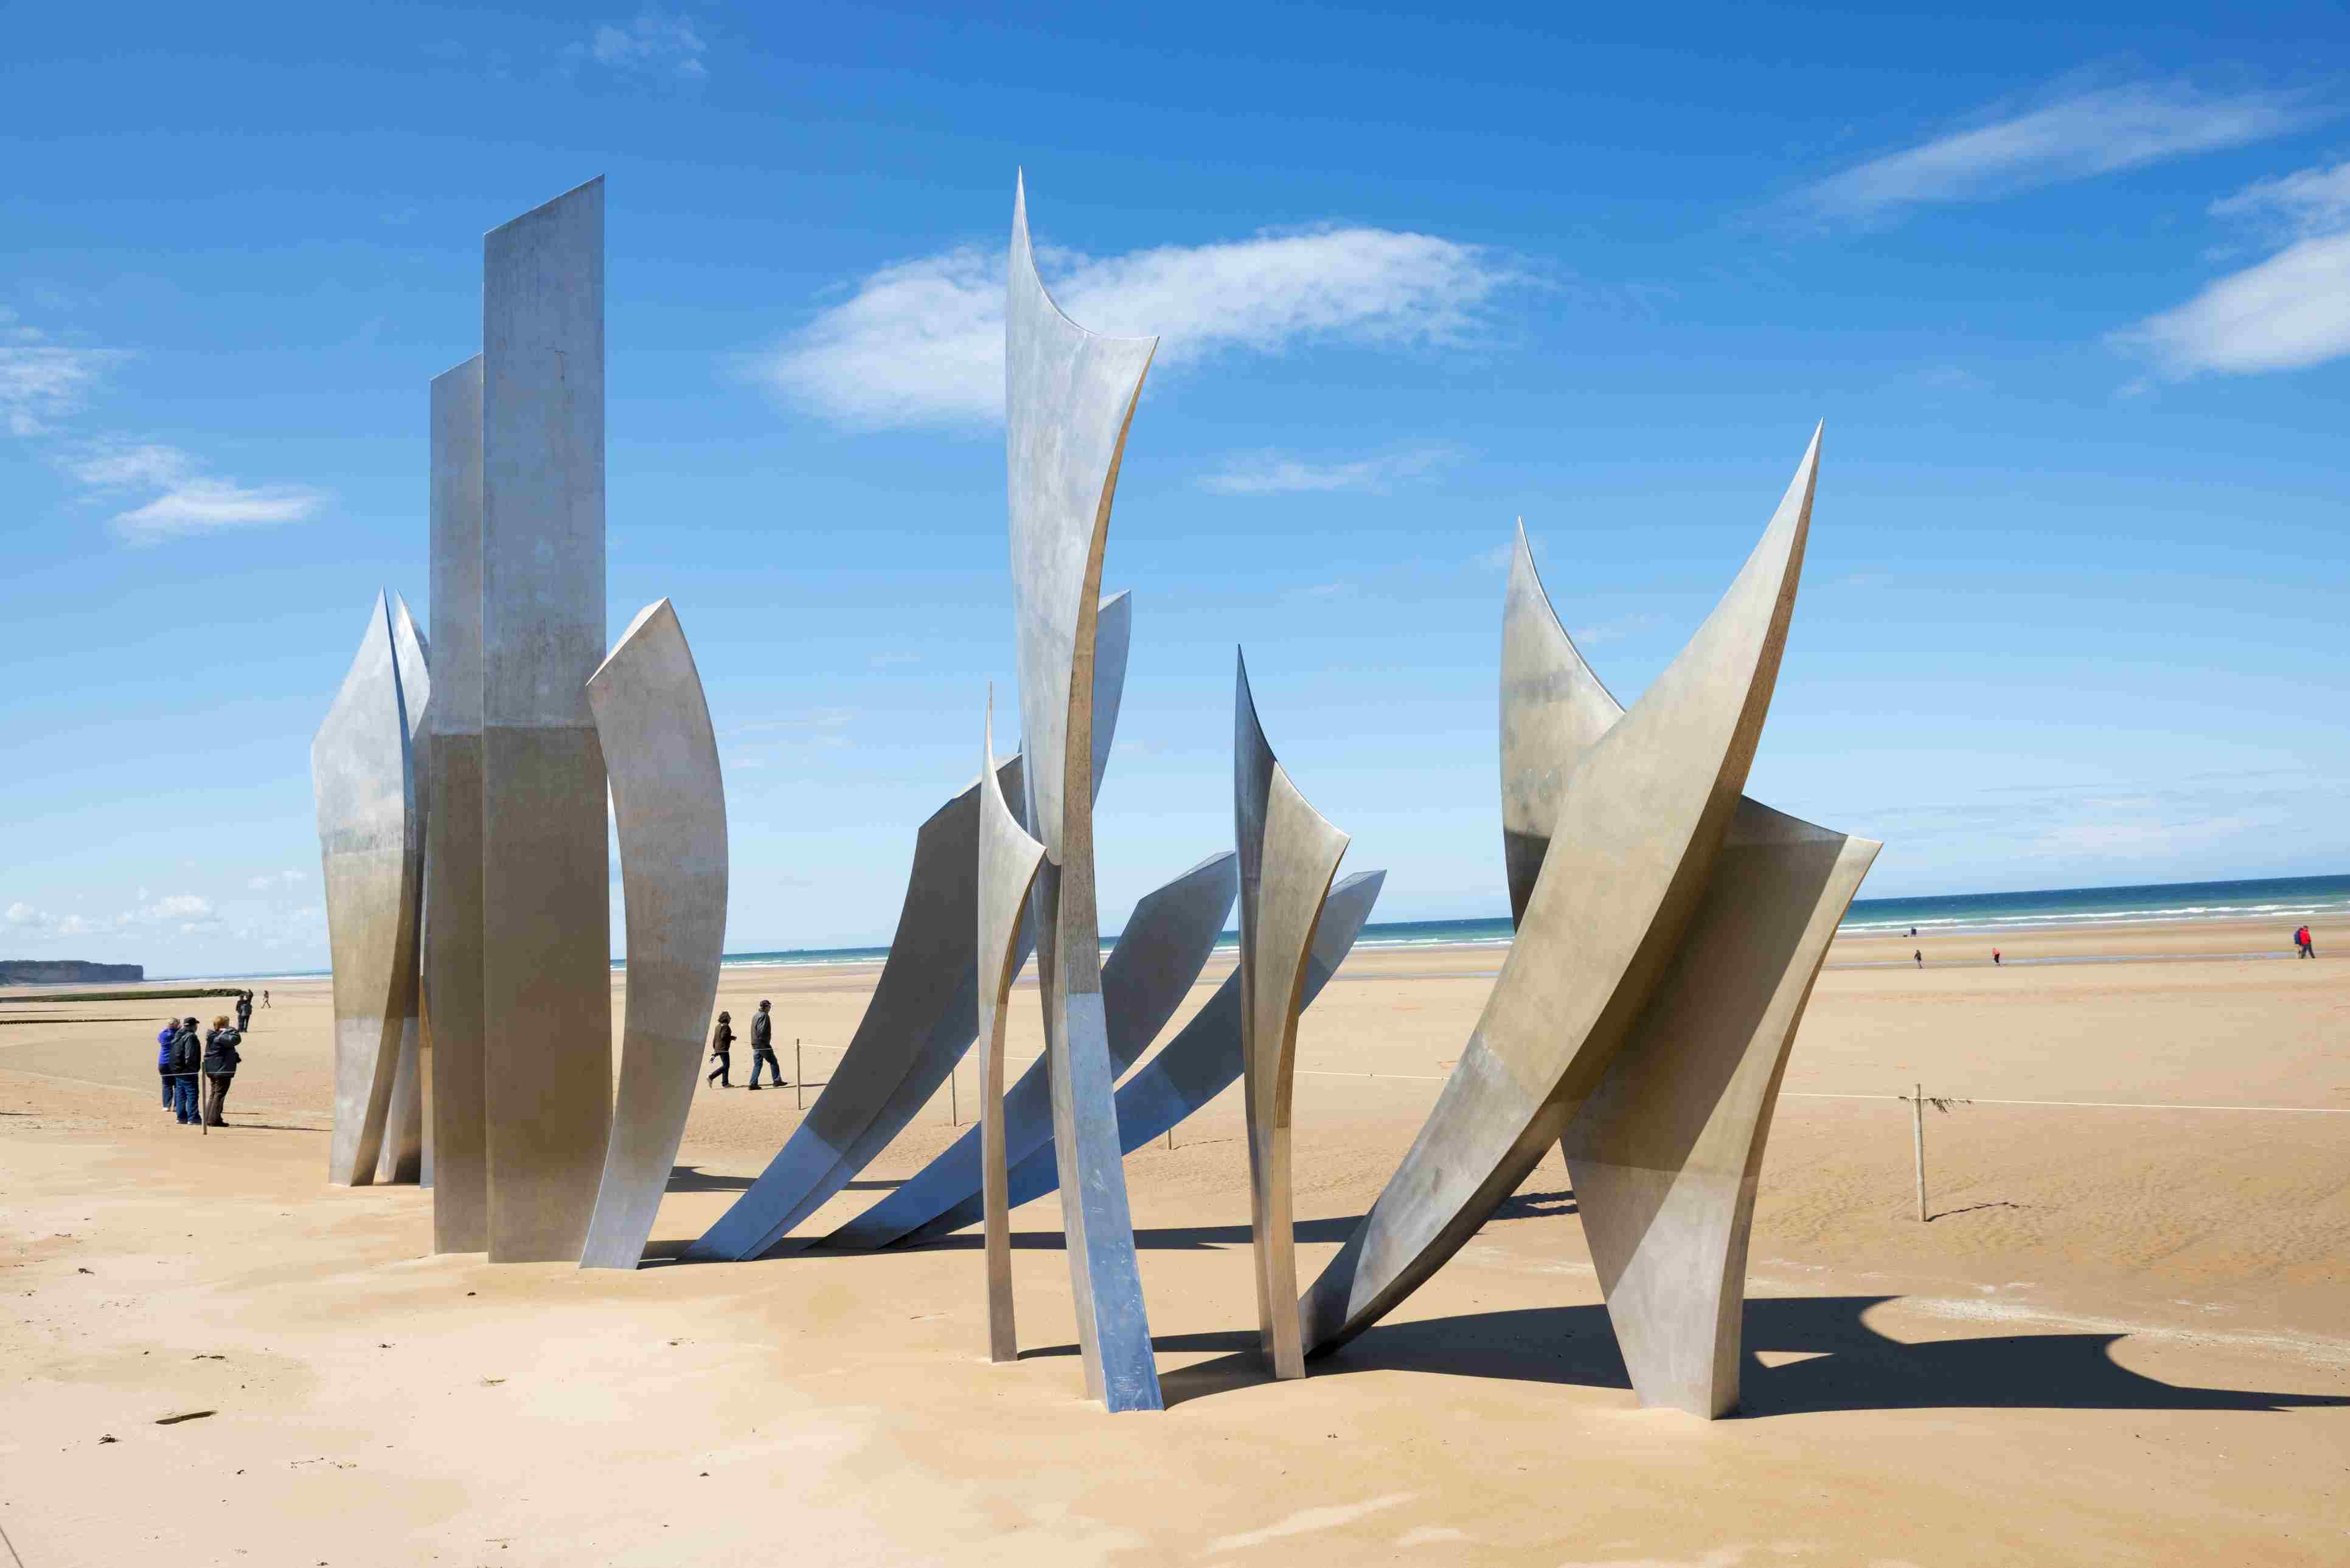 Omaha Beach Les Braves memorial - Normandy, France